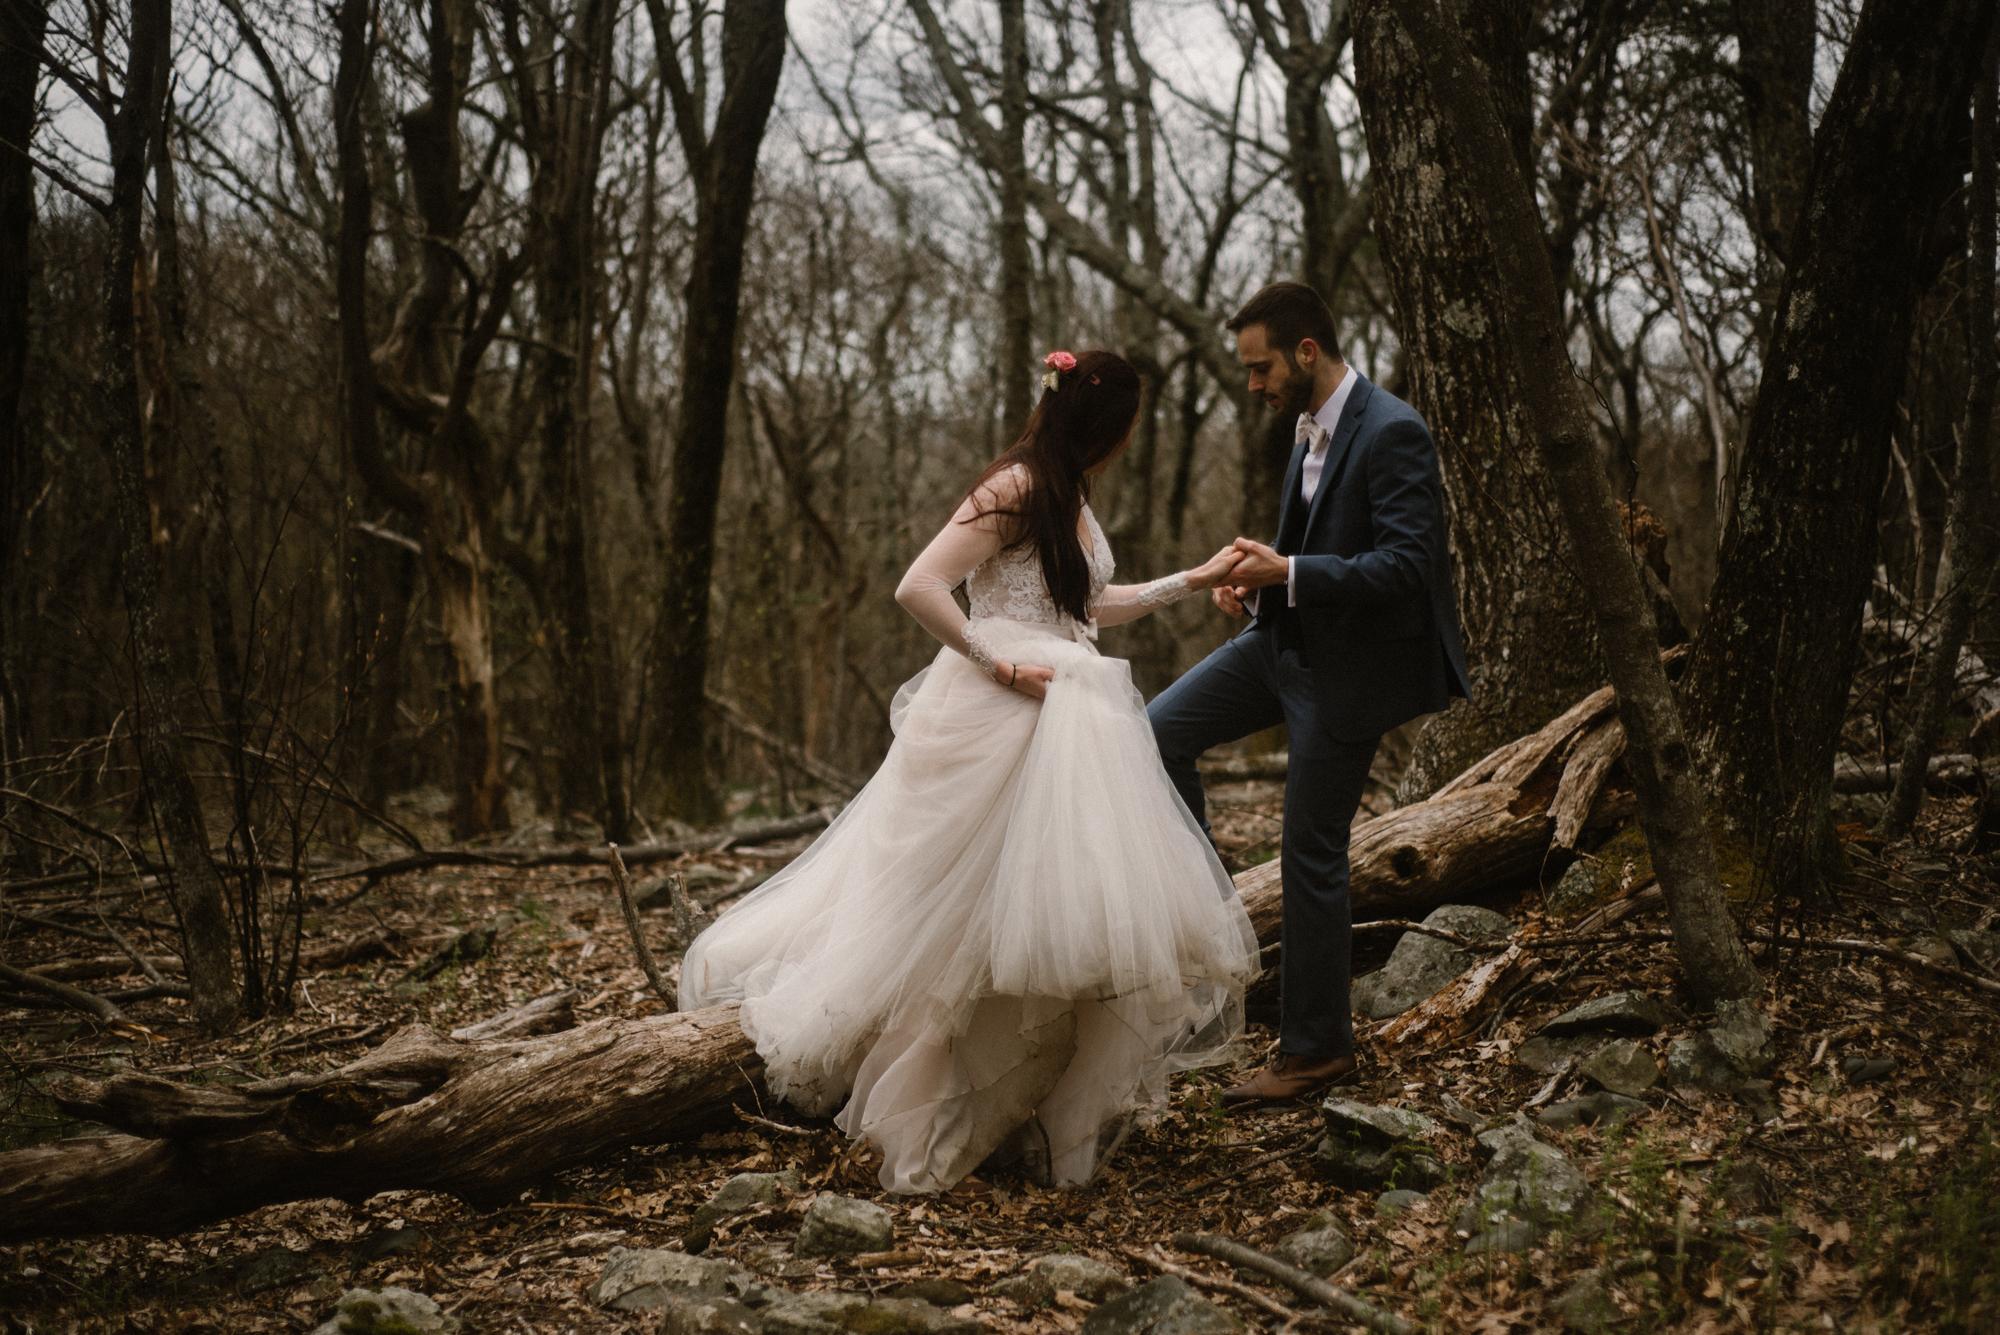 Paula and Andrew - Small Adventurous Wedding in Shenandoah National Park - Blue Ridge Mountain Wedding - White Sails Creative - Mountain Elopement_45.jpg